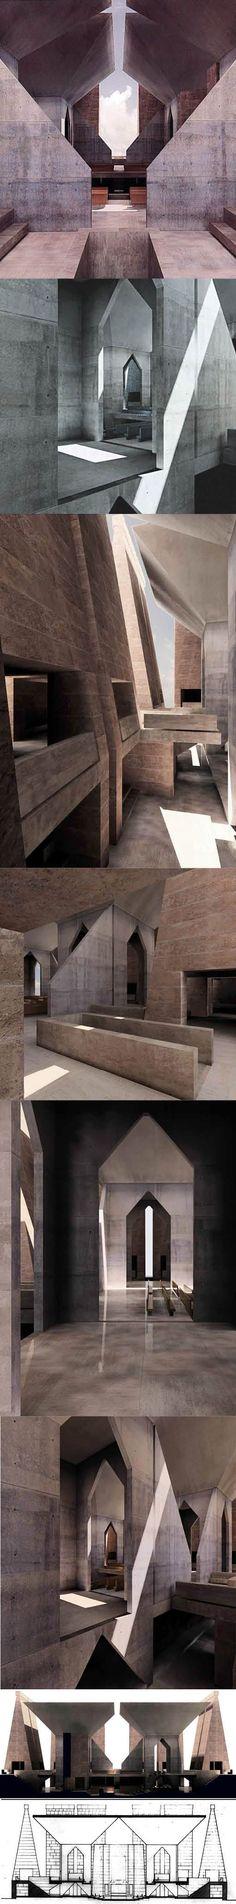 1967-1974 Louis Kahn - Hurva Synagogue | Jerusalem, Israel #moderne #architektur #modern #architecture